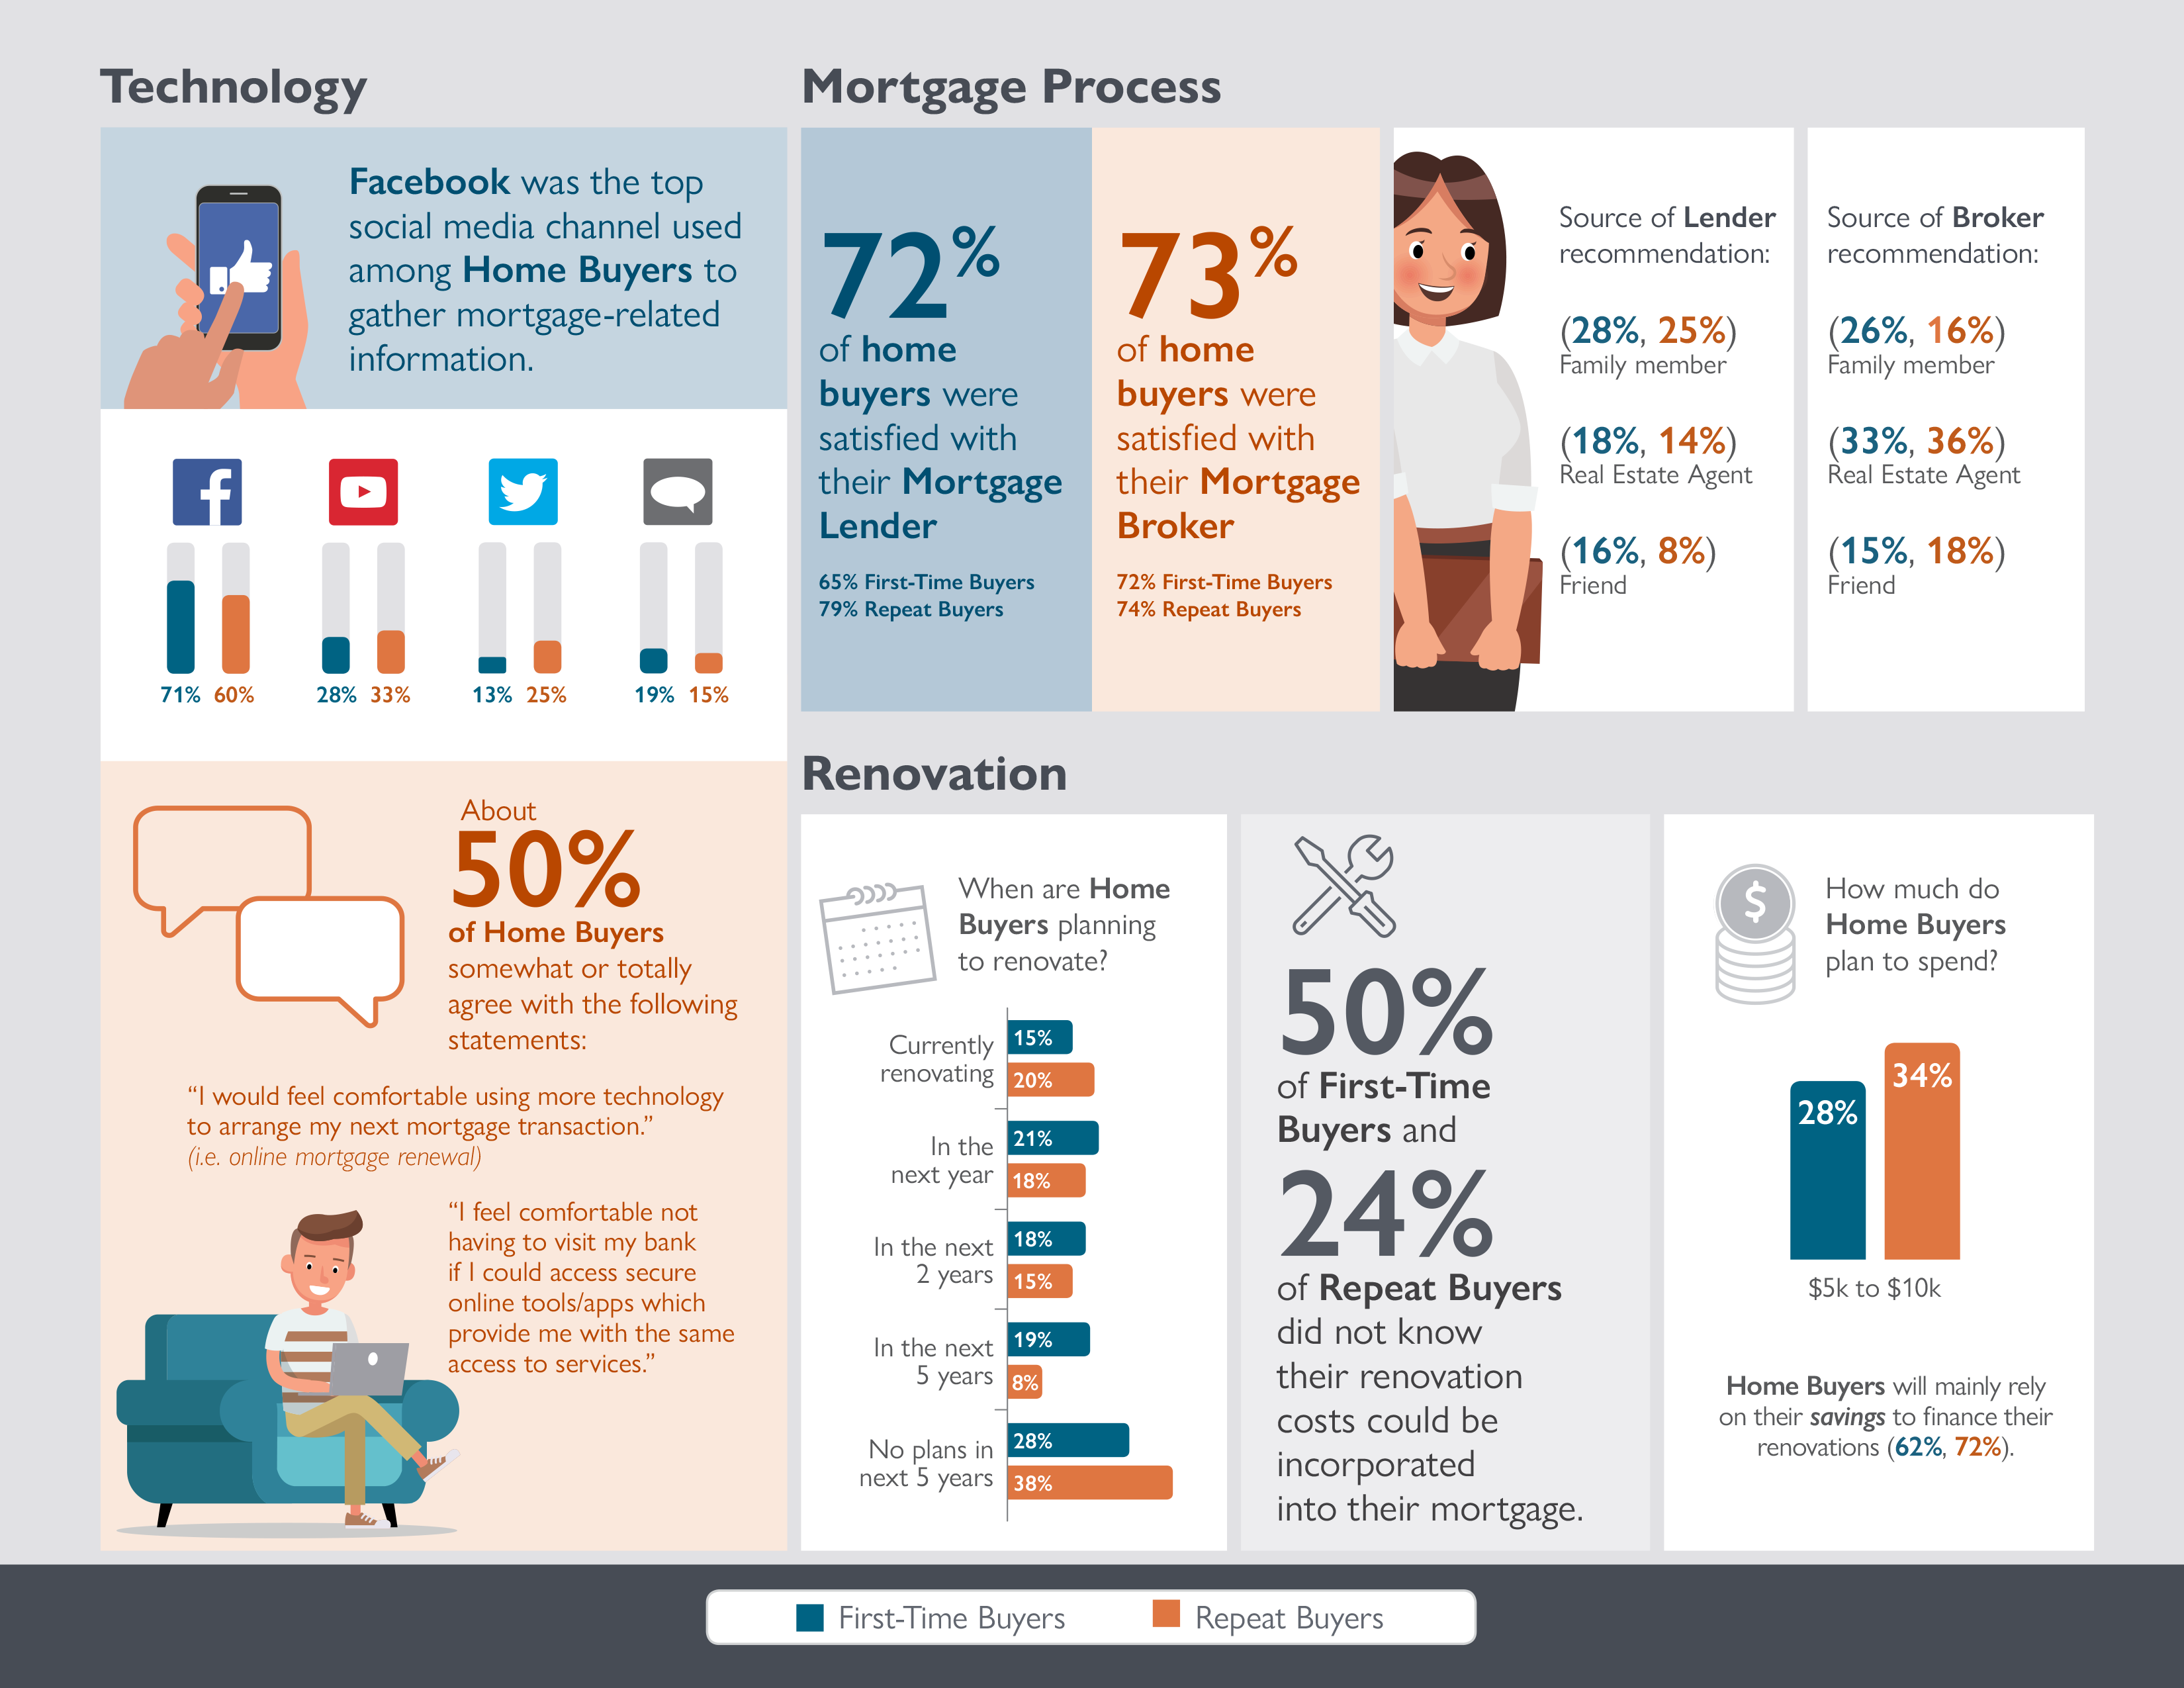 mcs-homebuyers-2018-3.png